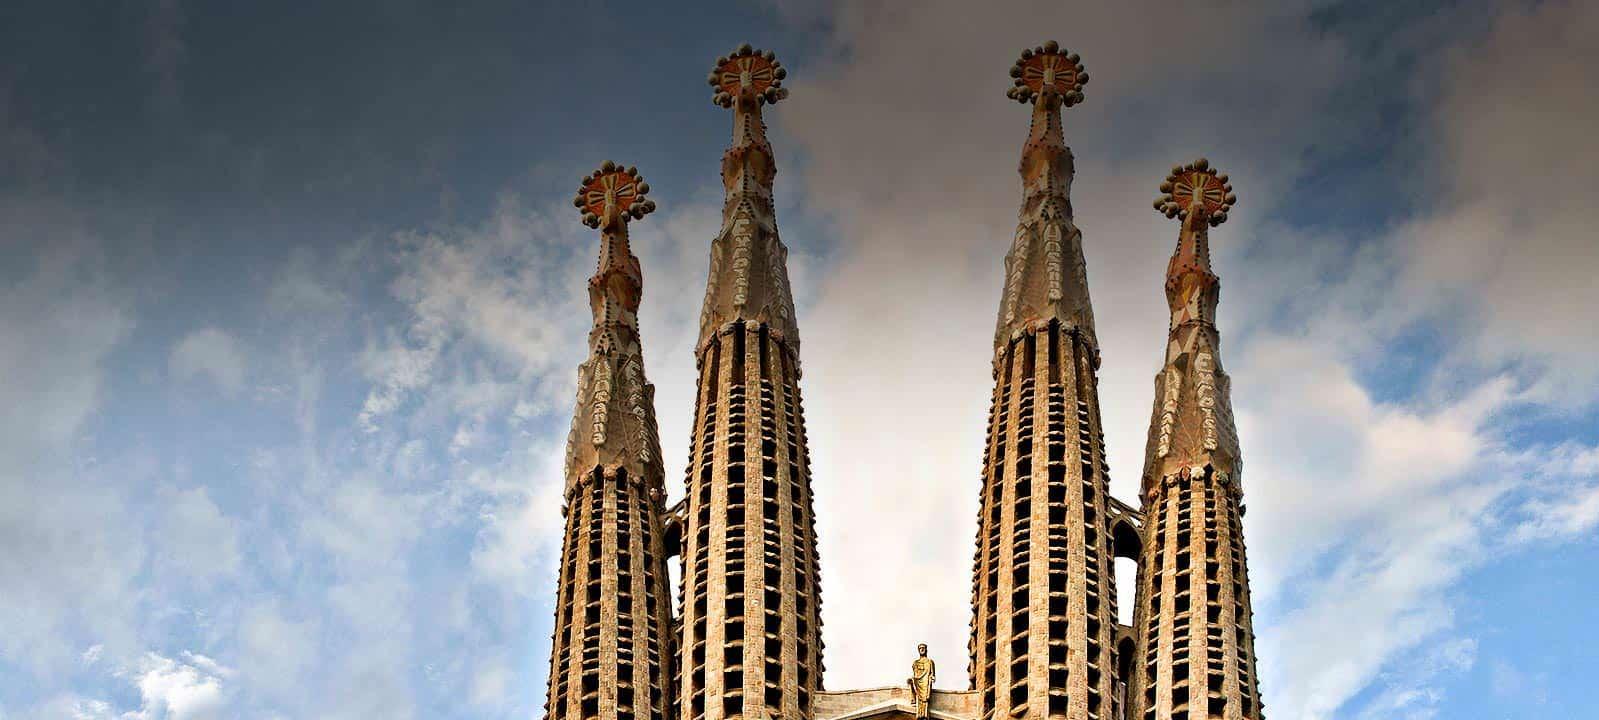 Sagrada fam lia puertas abiertas un buen d a en barcelona for De la sagrada familia